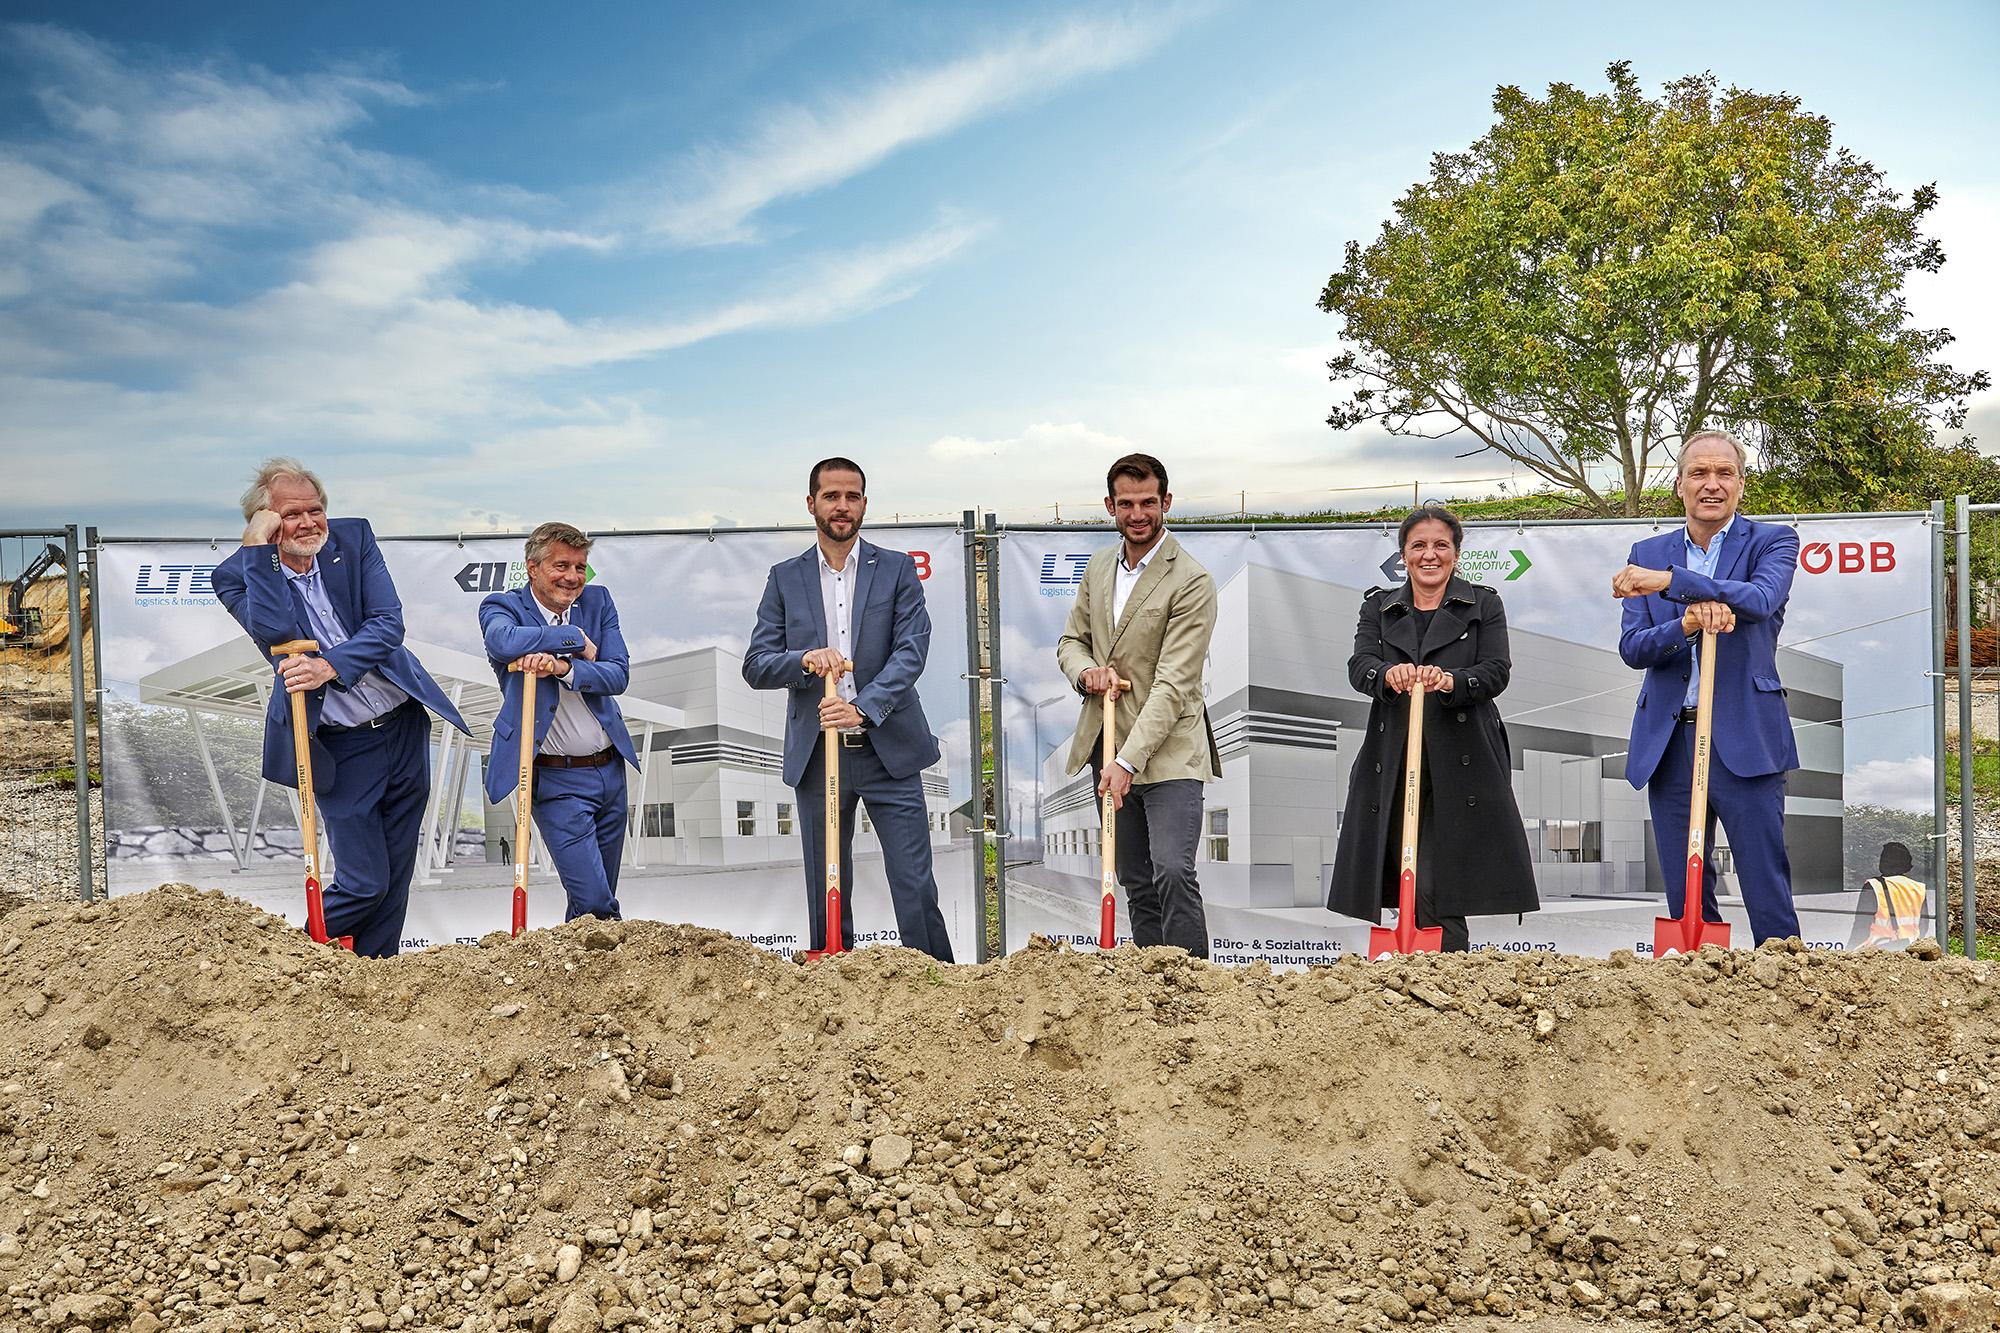 (vlnr) Andreas Mandl (CEO LTE-group), Michael Benda (CFO LTE-group), Thomas Kollnig (LTE-group), Armin Wohlfahrter (ÖBB), Sandra Karl-Gottbauer (ÖBB), Kai Brüggemann (ÖBB)